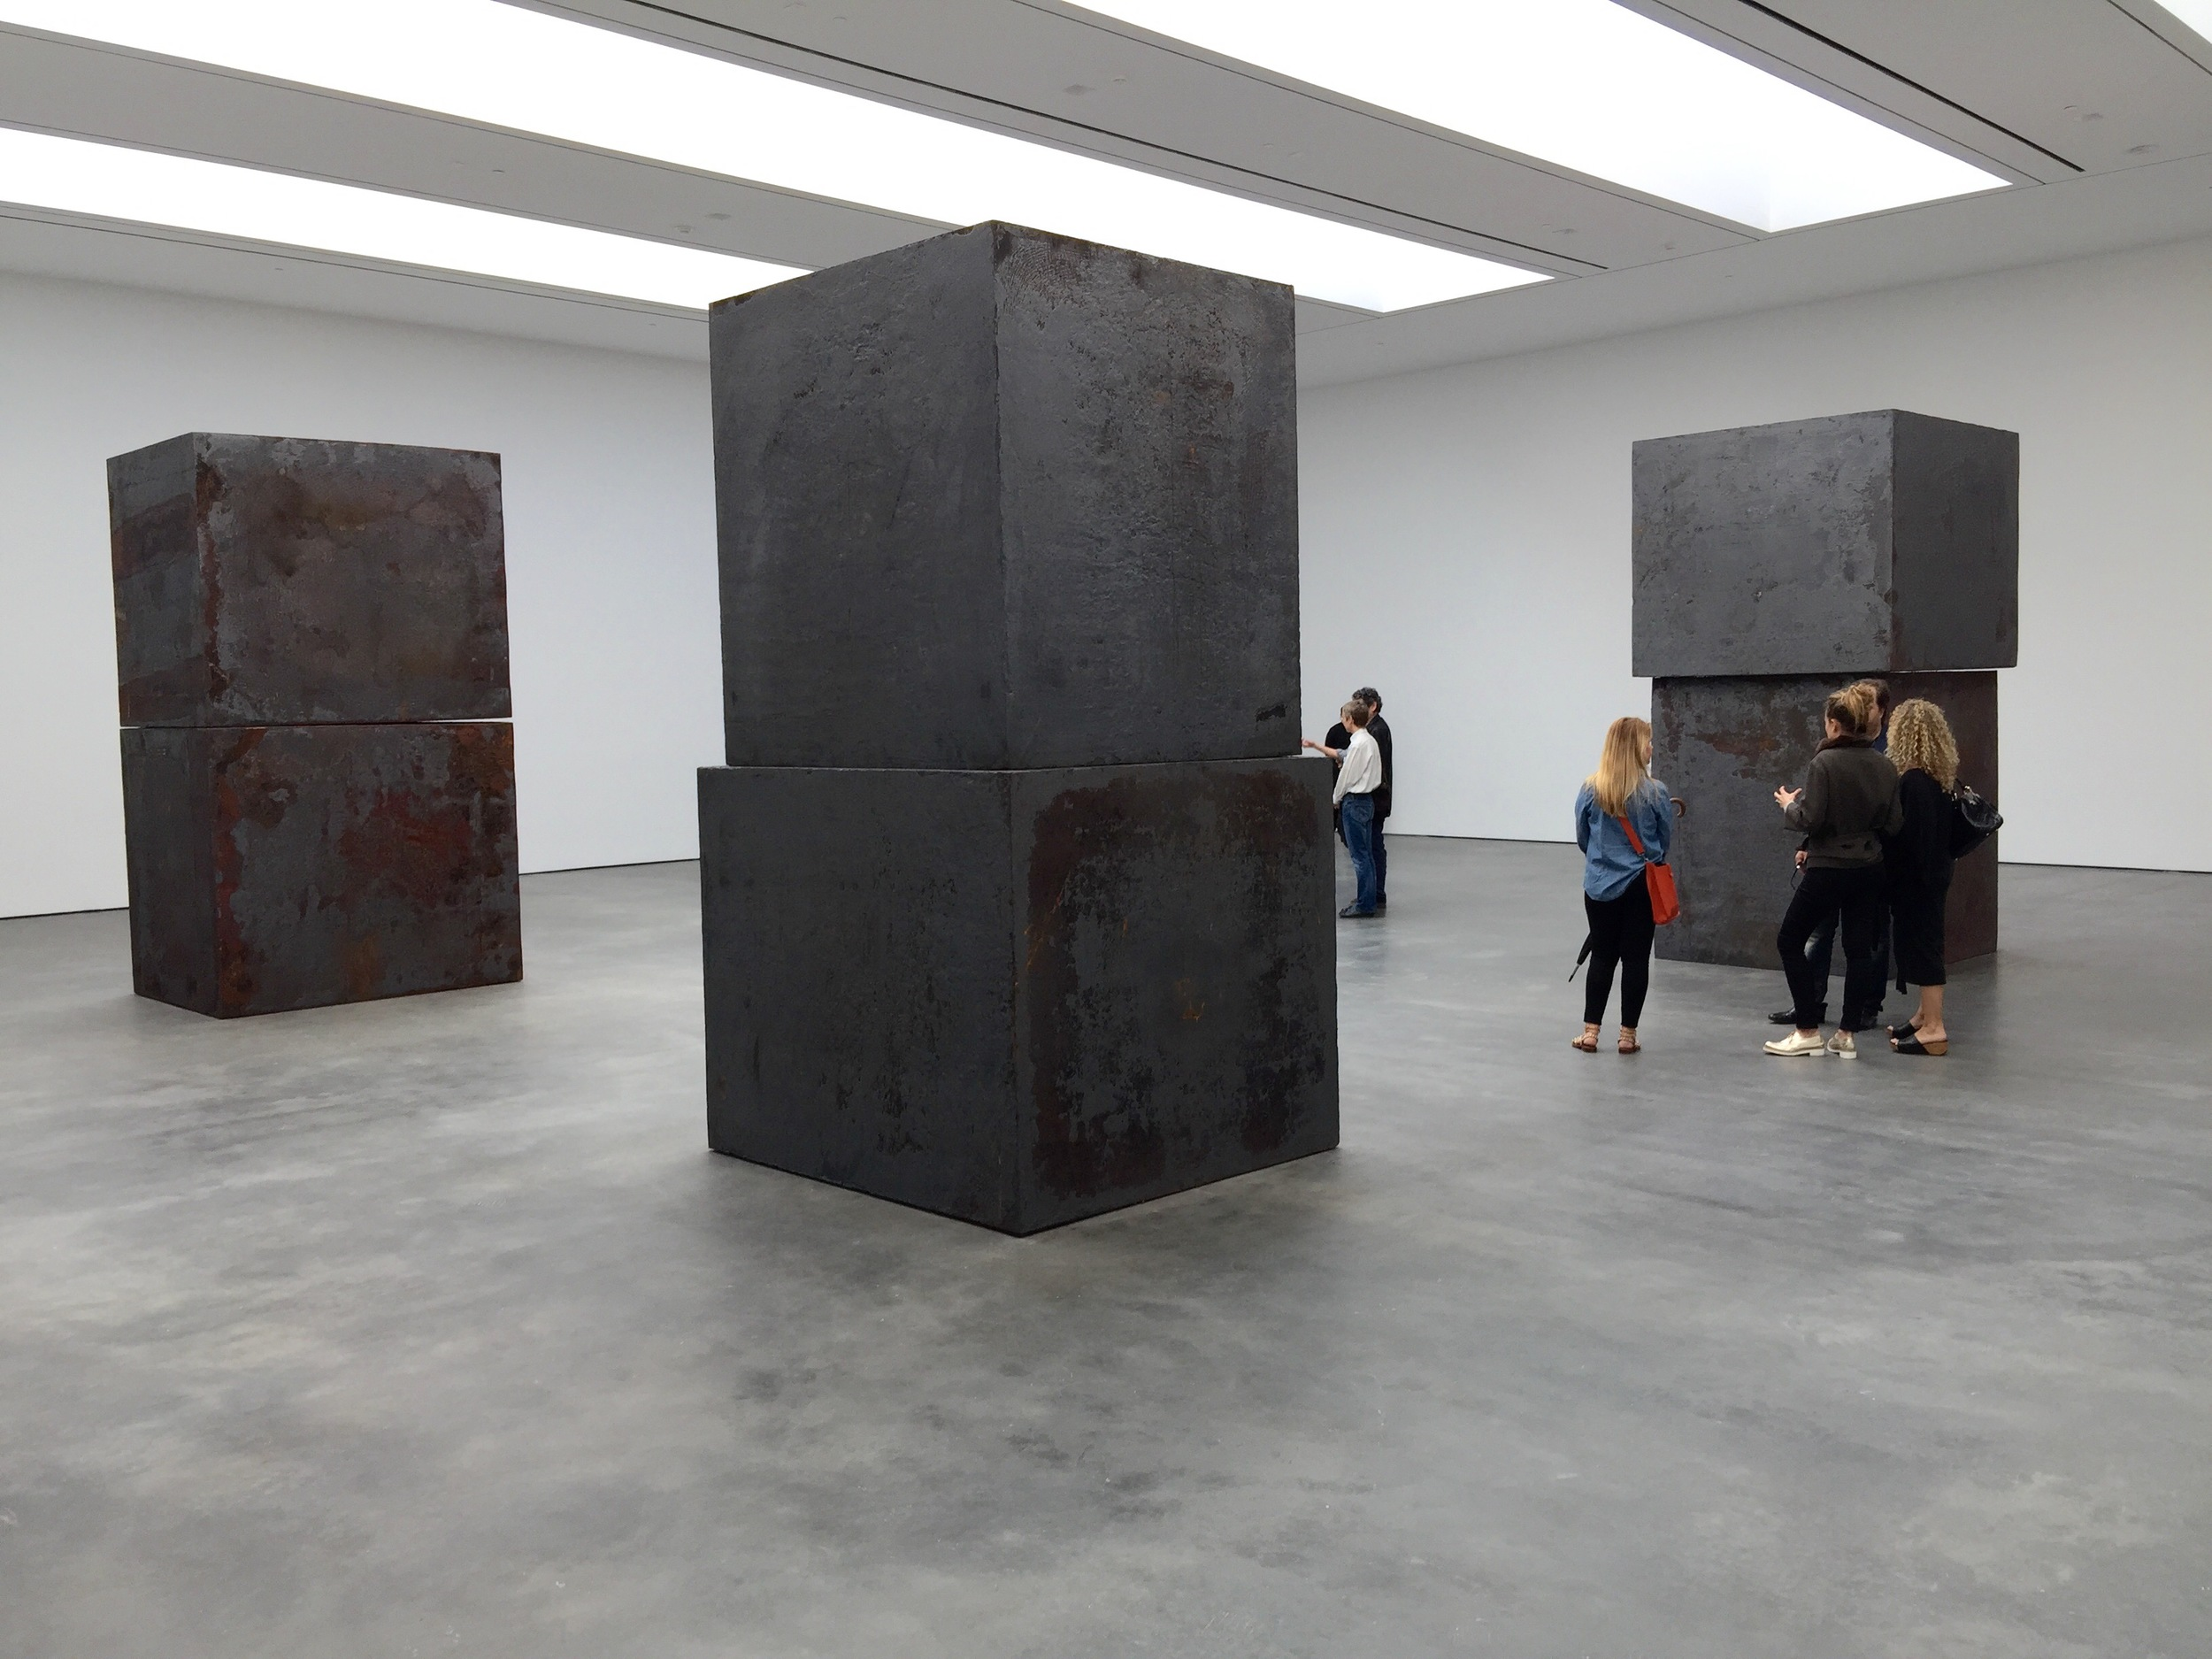 Richard Serra at David Zwirner